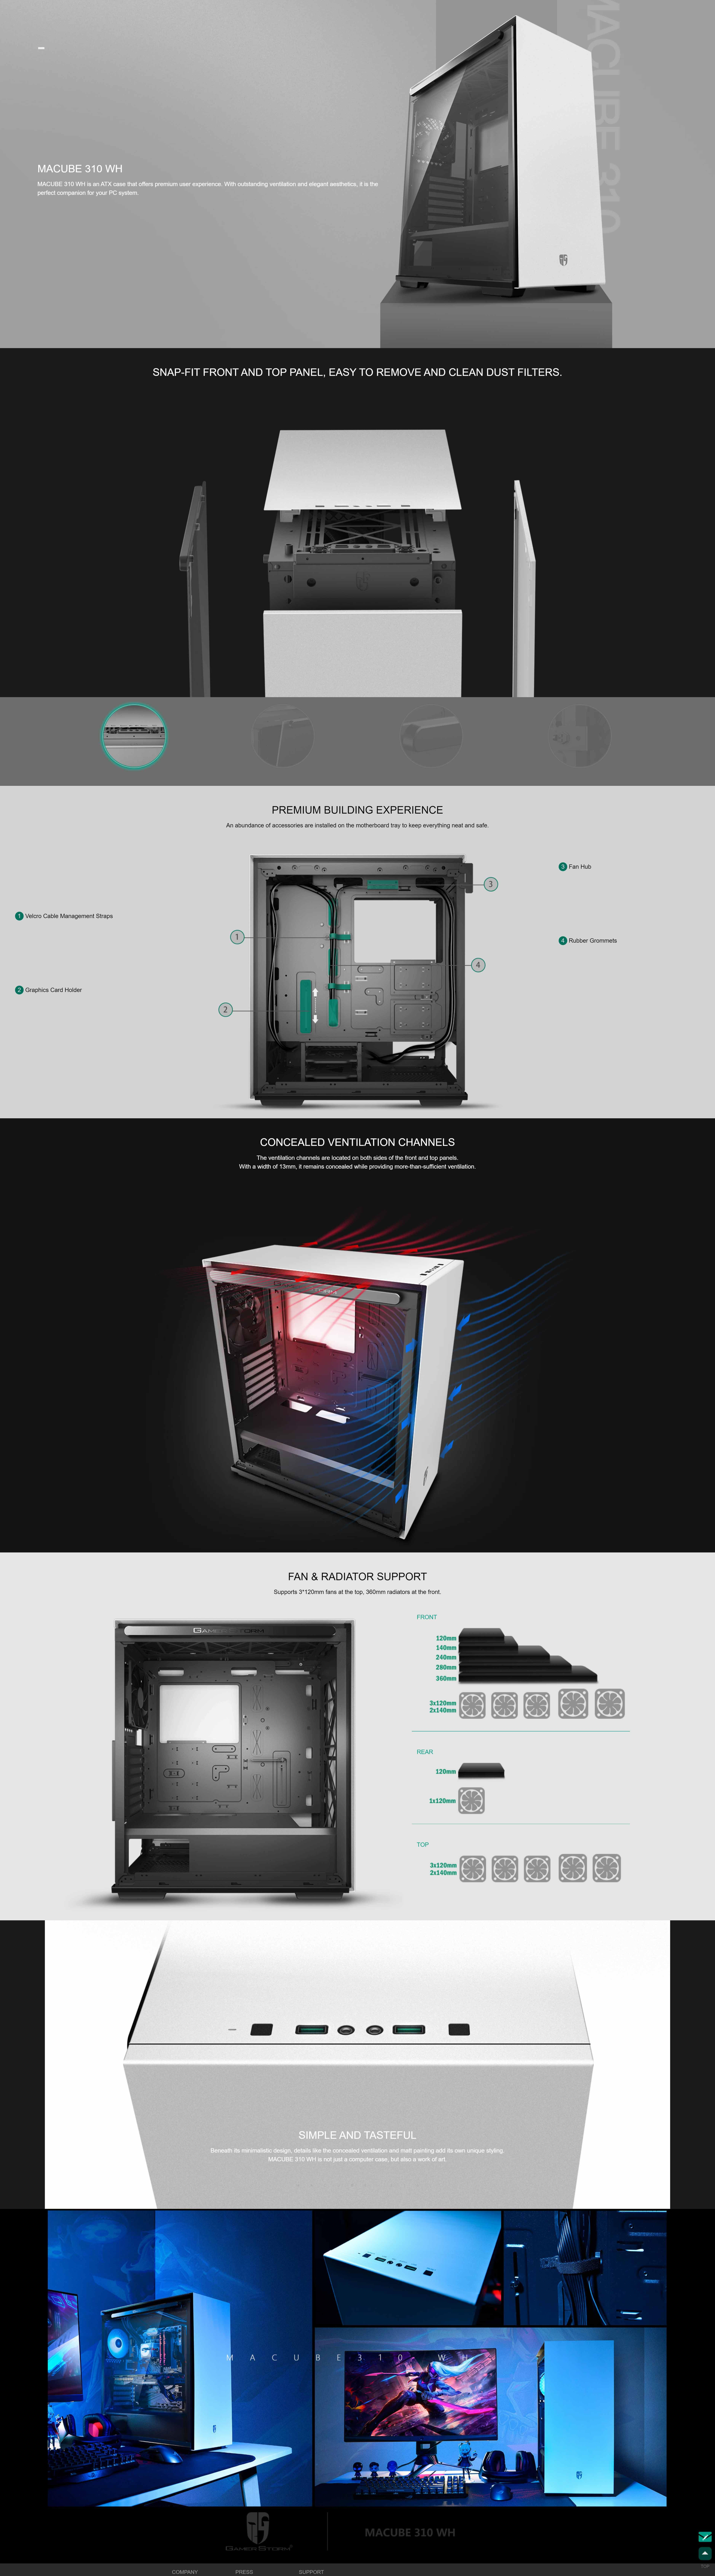 screencapture-gamerstorm-product-CASES-2019-08-1288-12022-shtml-2020-05-29-08_18_36.jpg